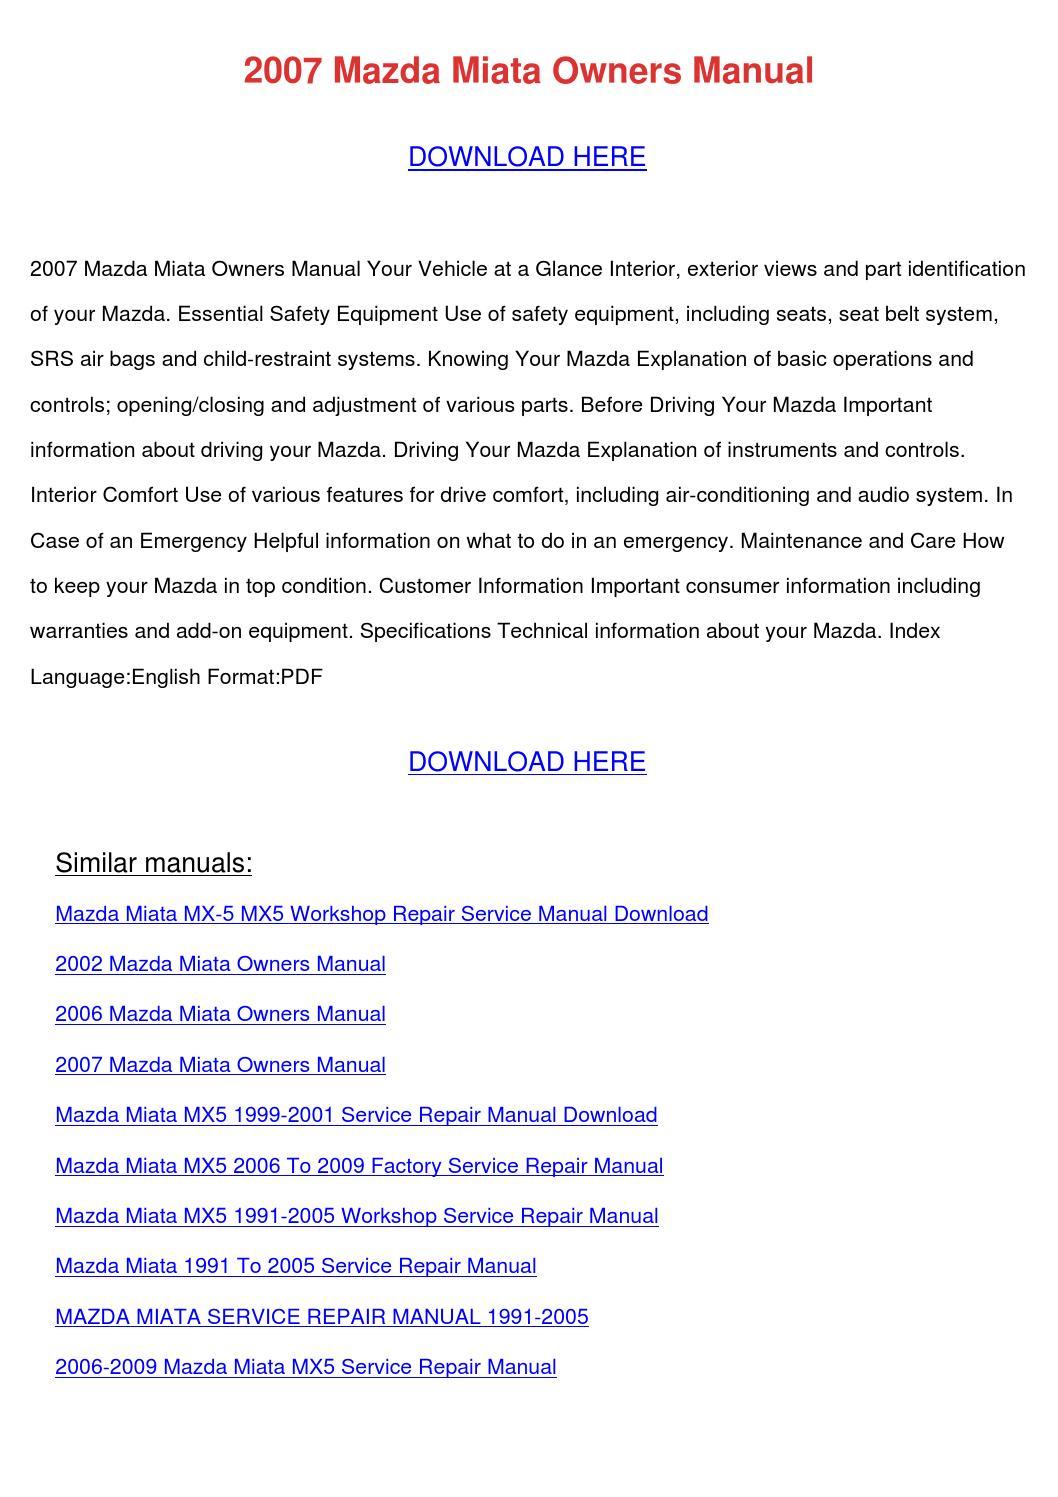 2007 mazda miata owners manual by wadetremblay issuu rh issuu com 2007 mazda miata owners manual Mazda Miata Owner's Manual